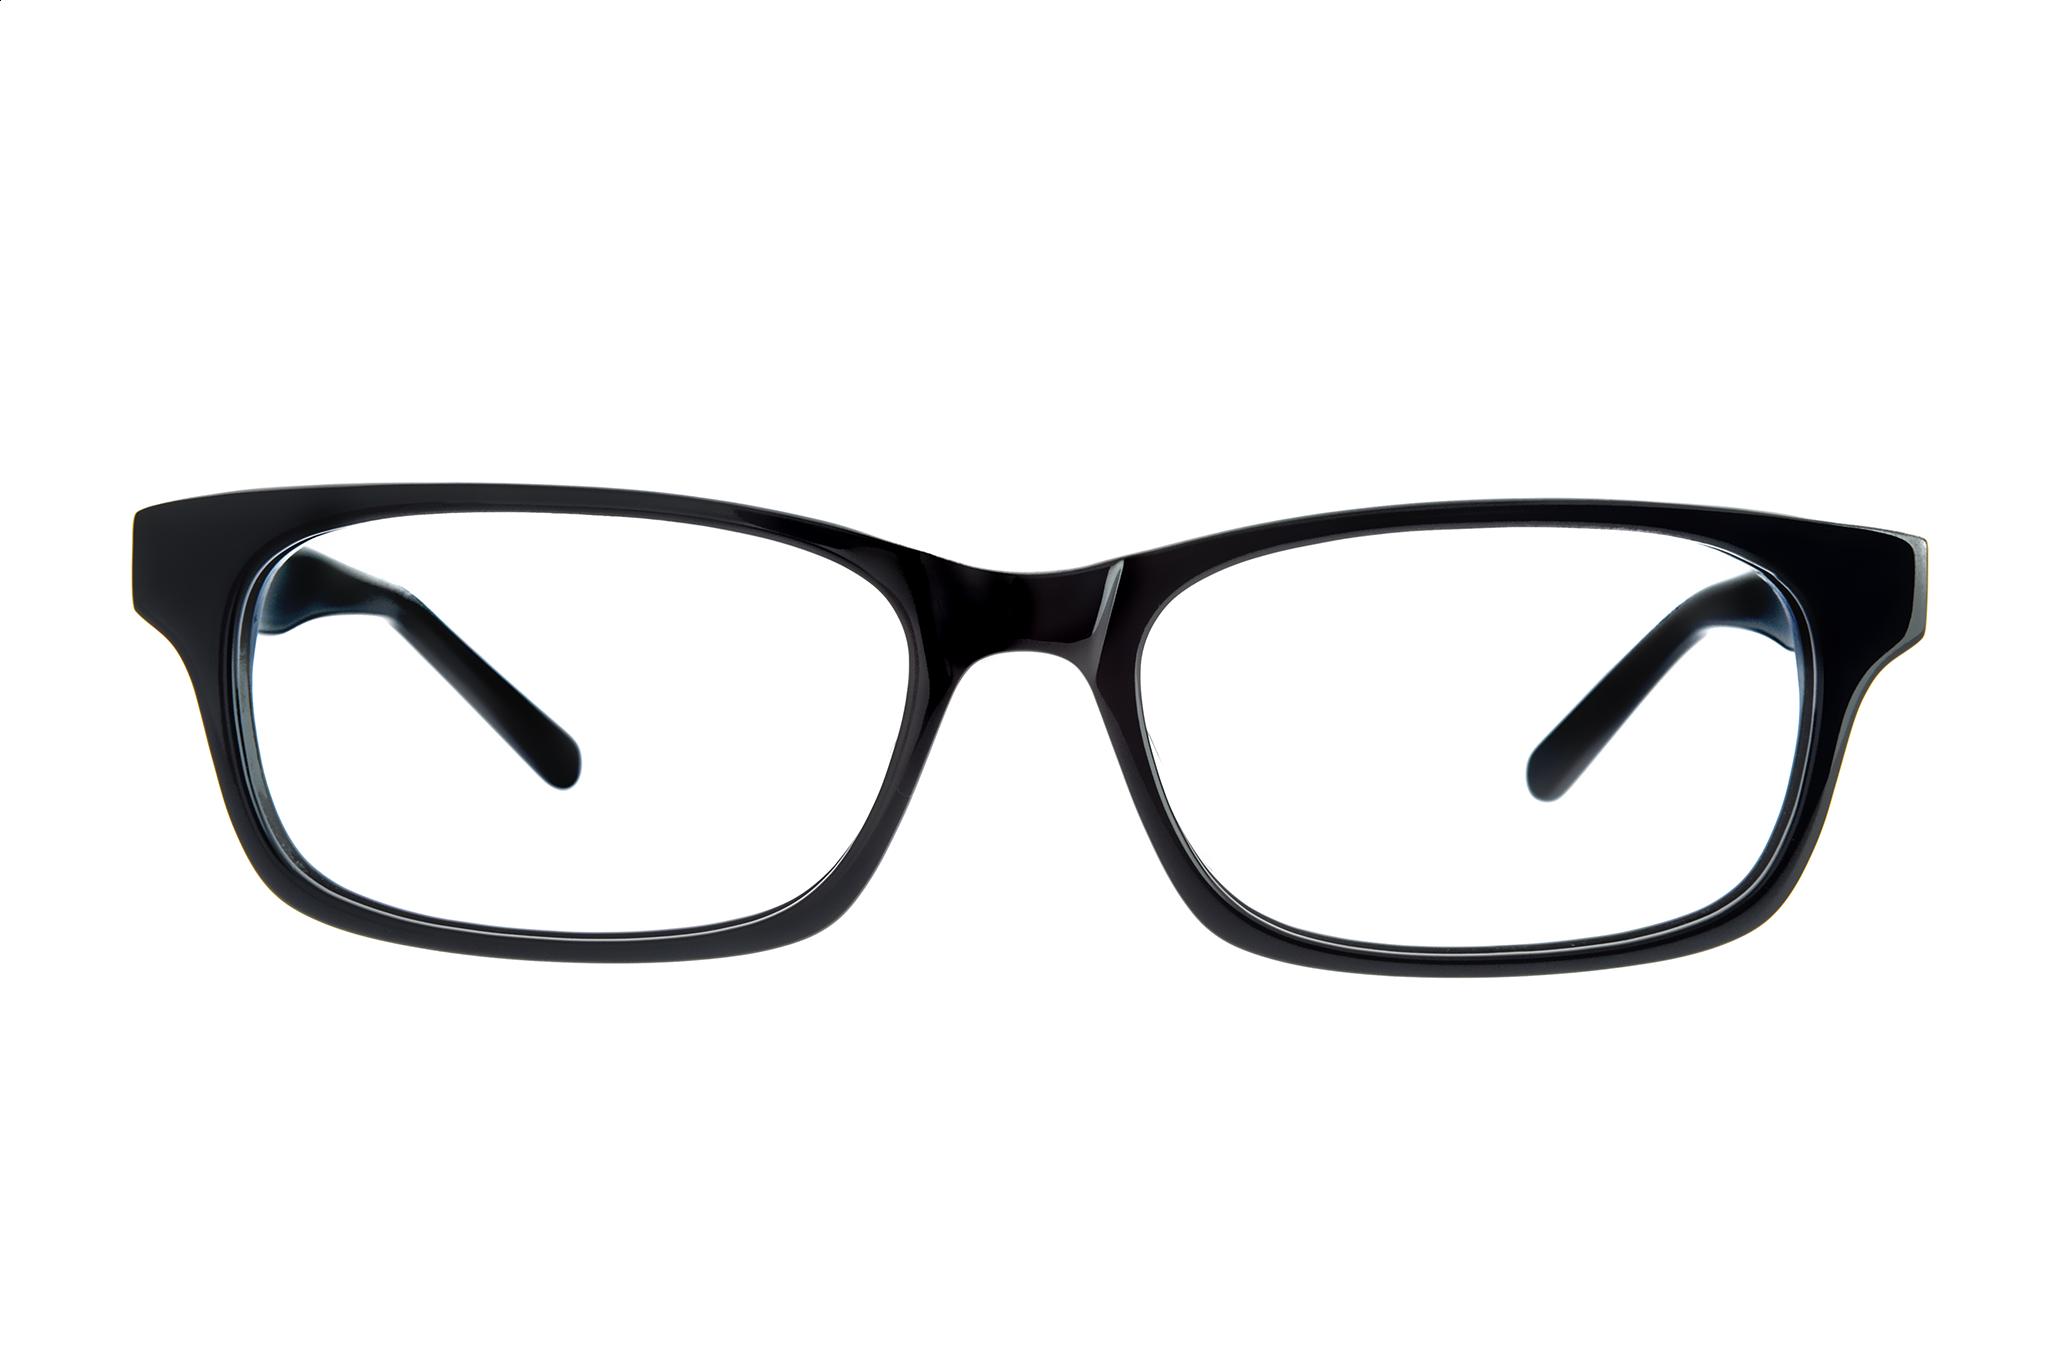 Glasses Png Image Black Eyeglasses Frames Free Glasses Glasses